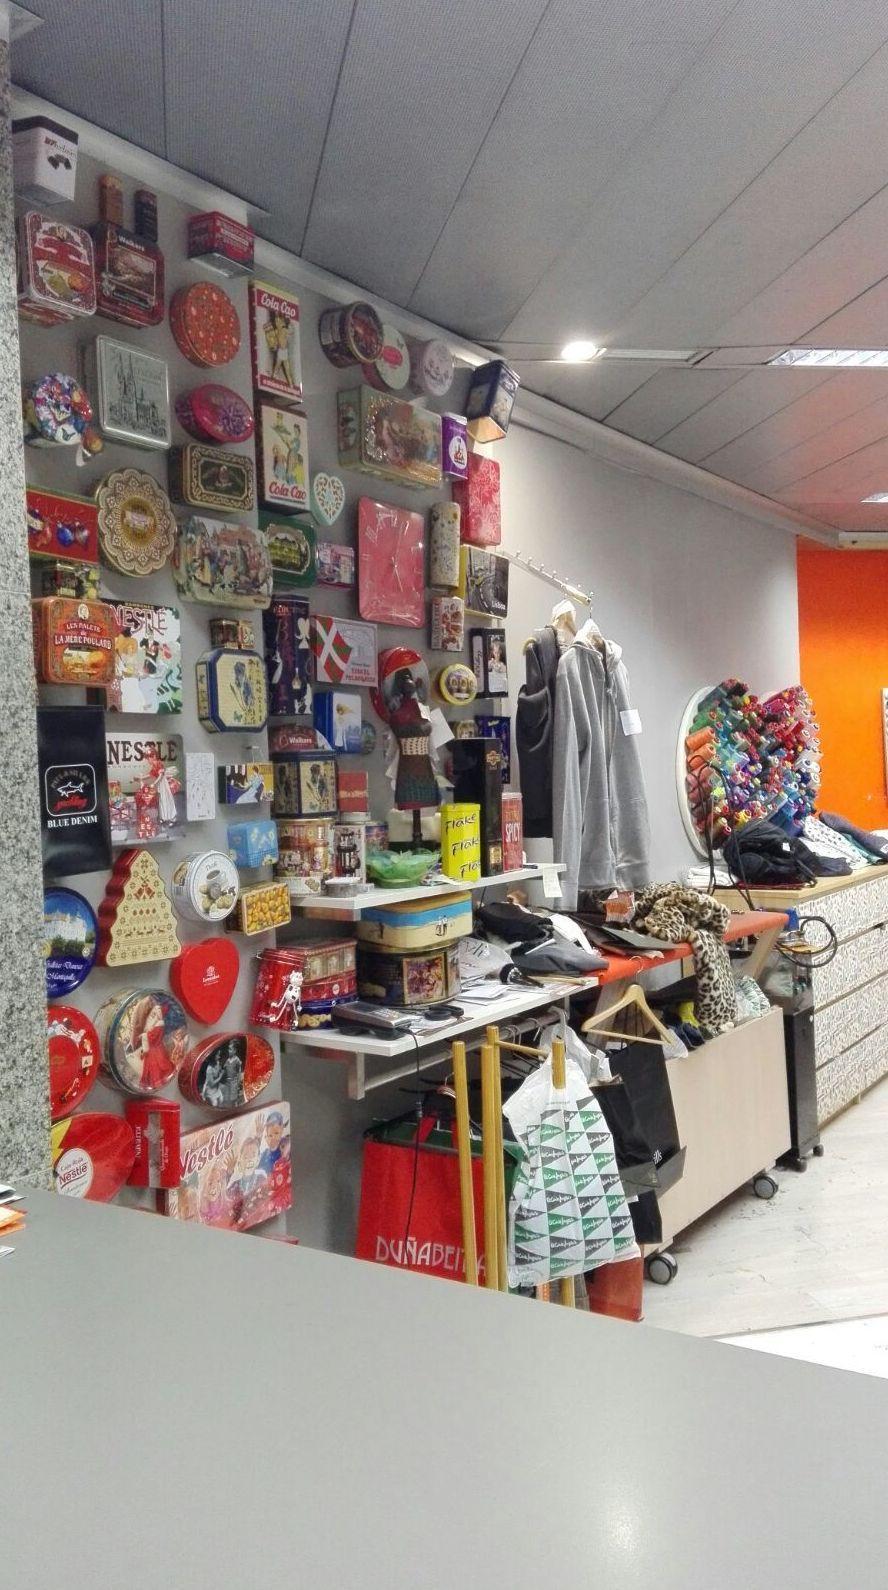 Foto 14 de Arreglos de ropa en Bilbao | A'Coser